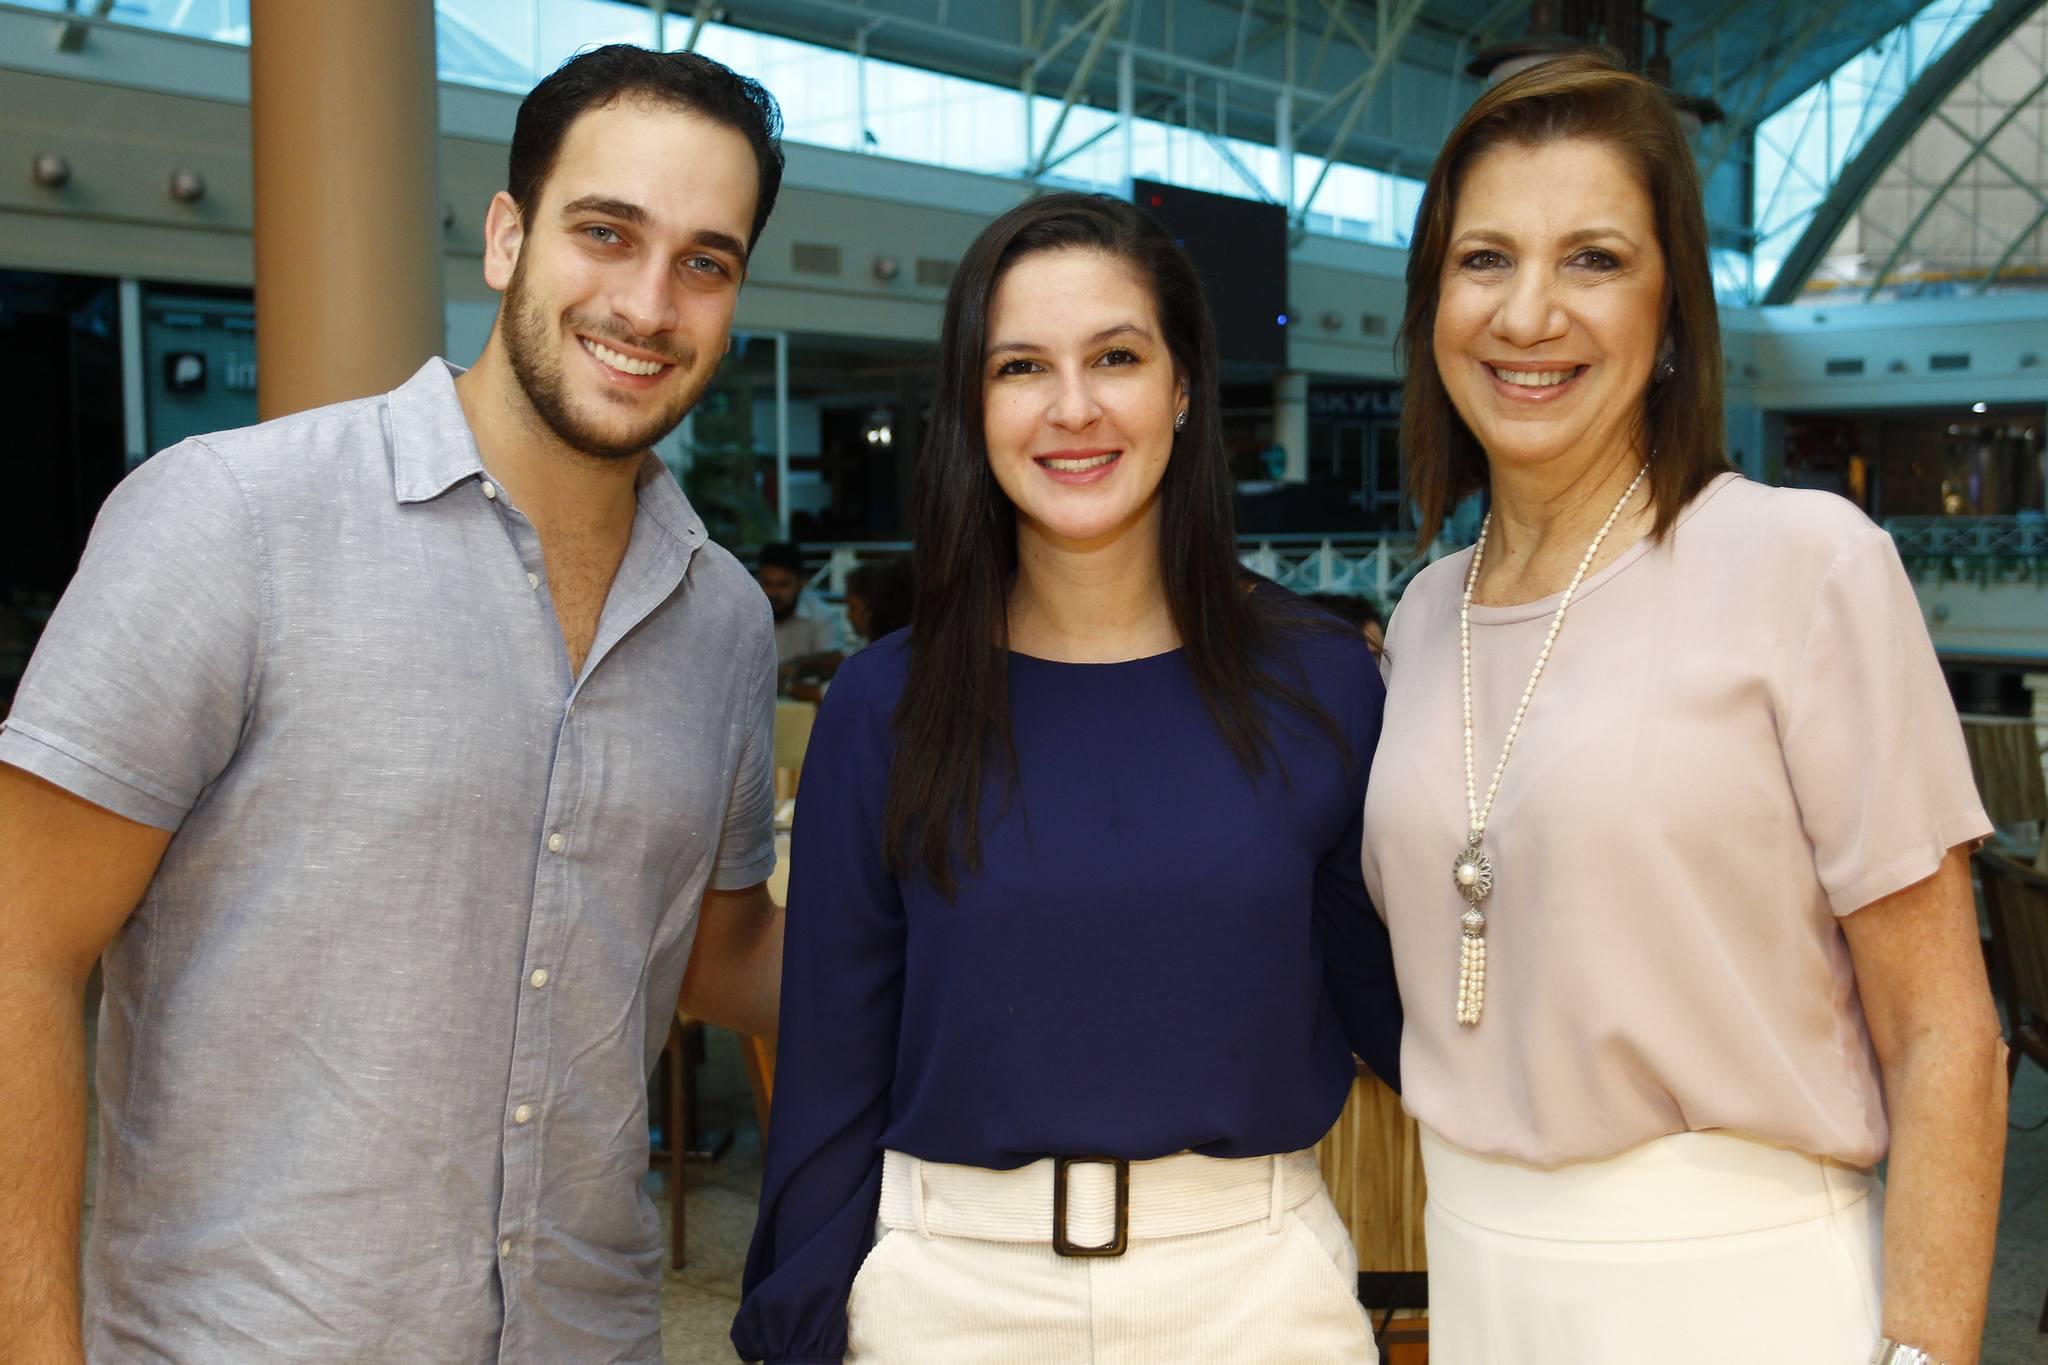 Ricardo Brasil, Naiana Lima E Ana Luiza